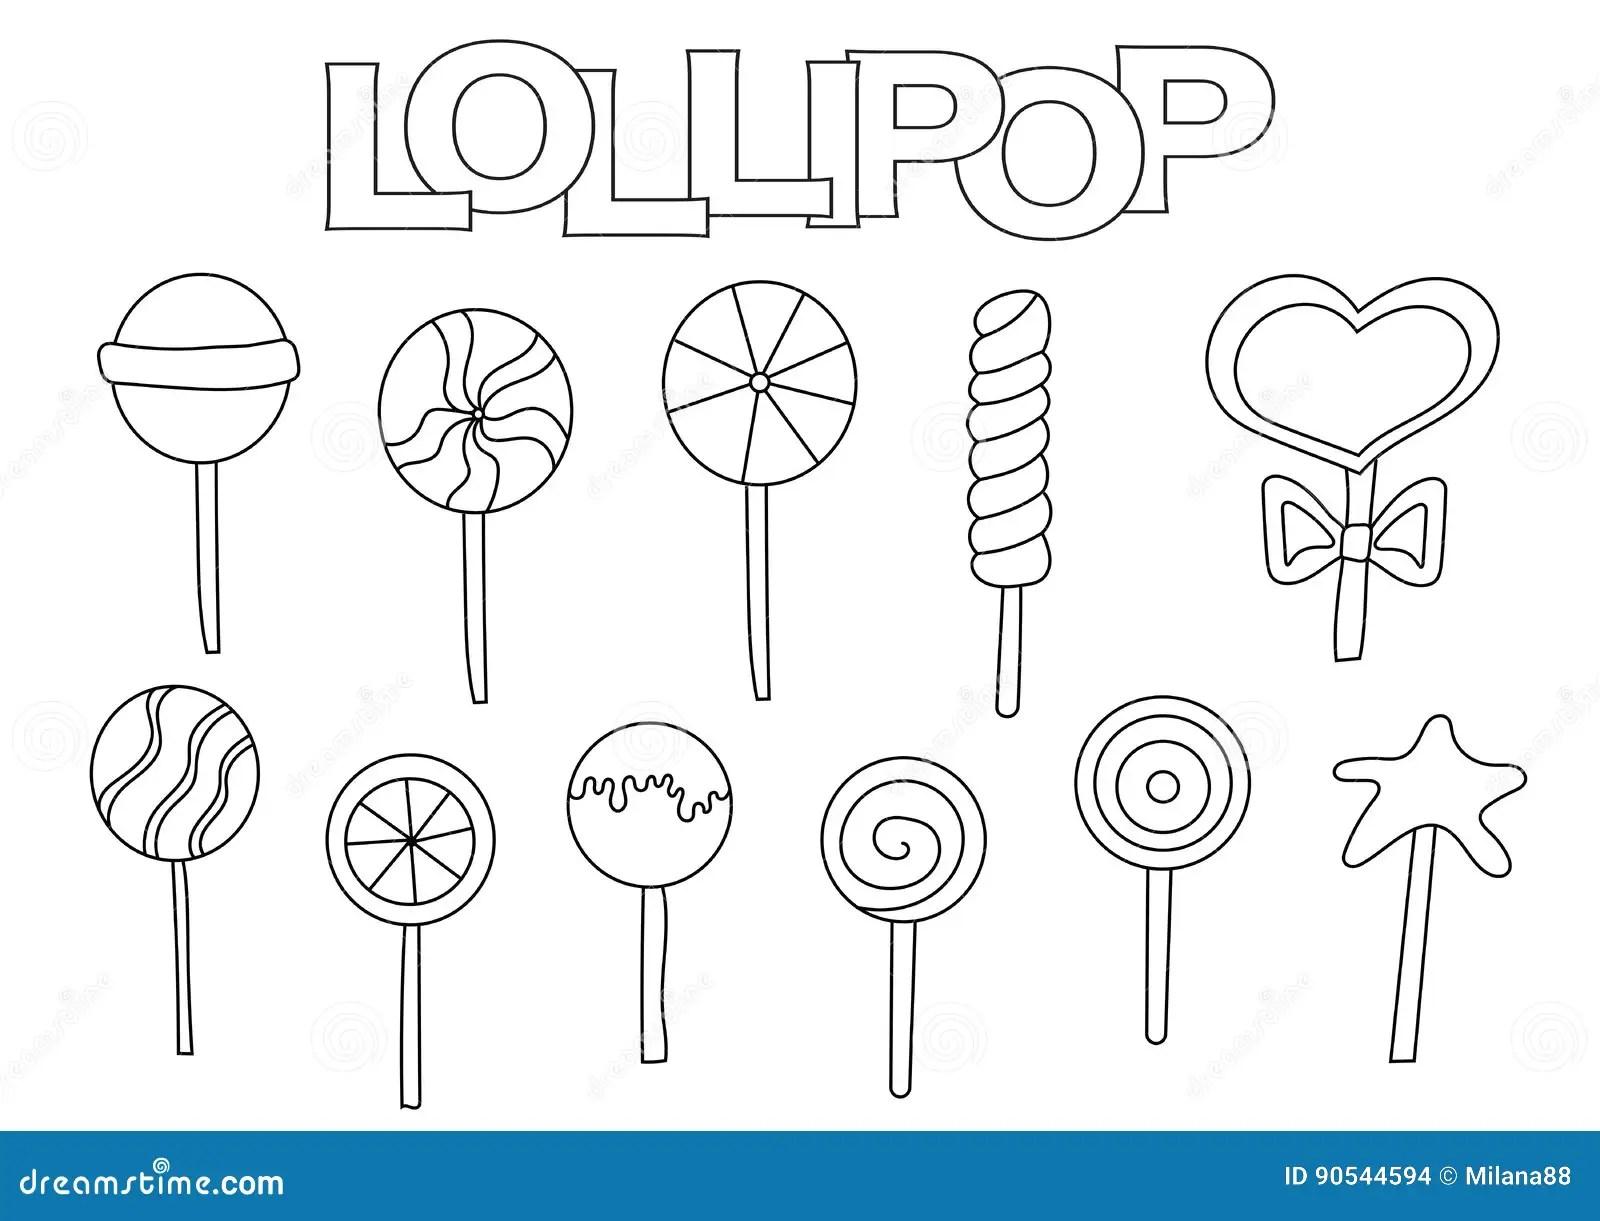 Lollipop Elements Hand Drawn Set. Coloring Book Template